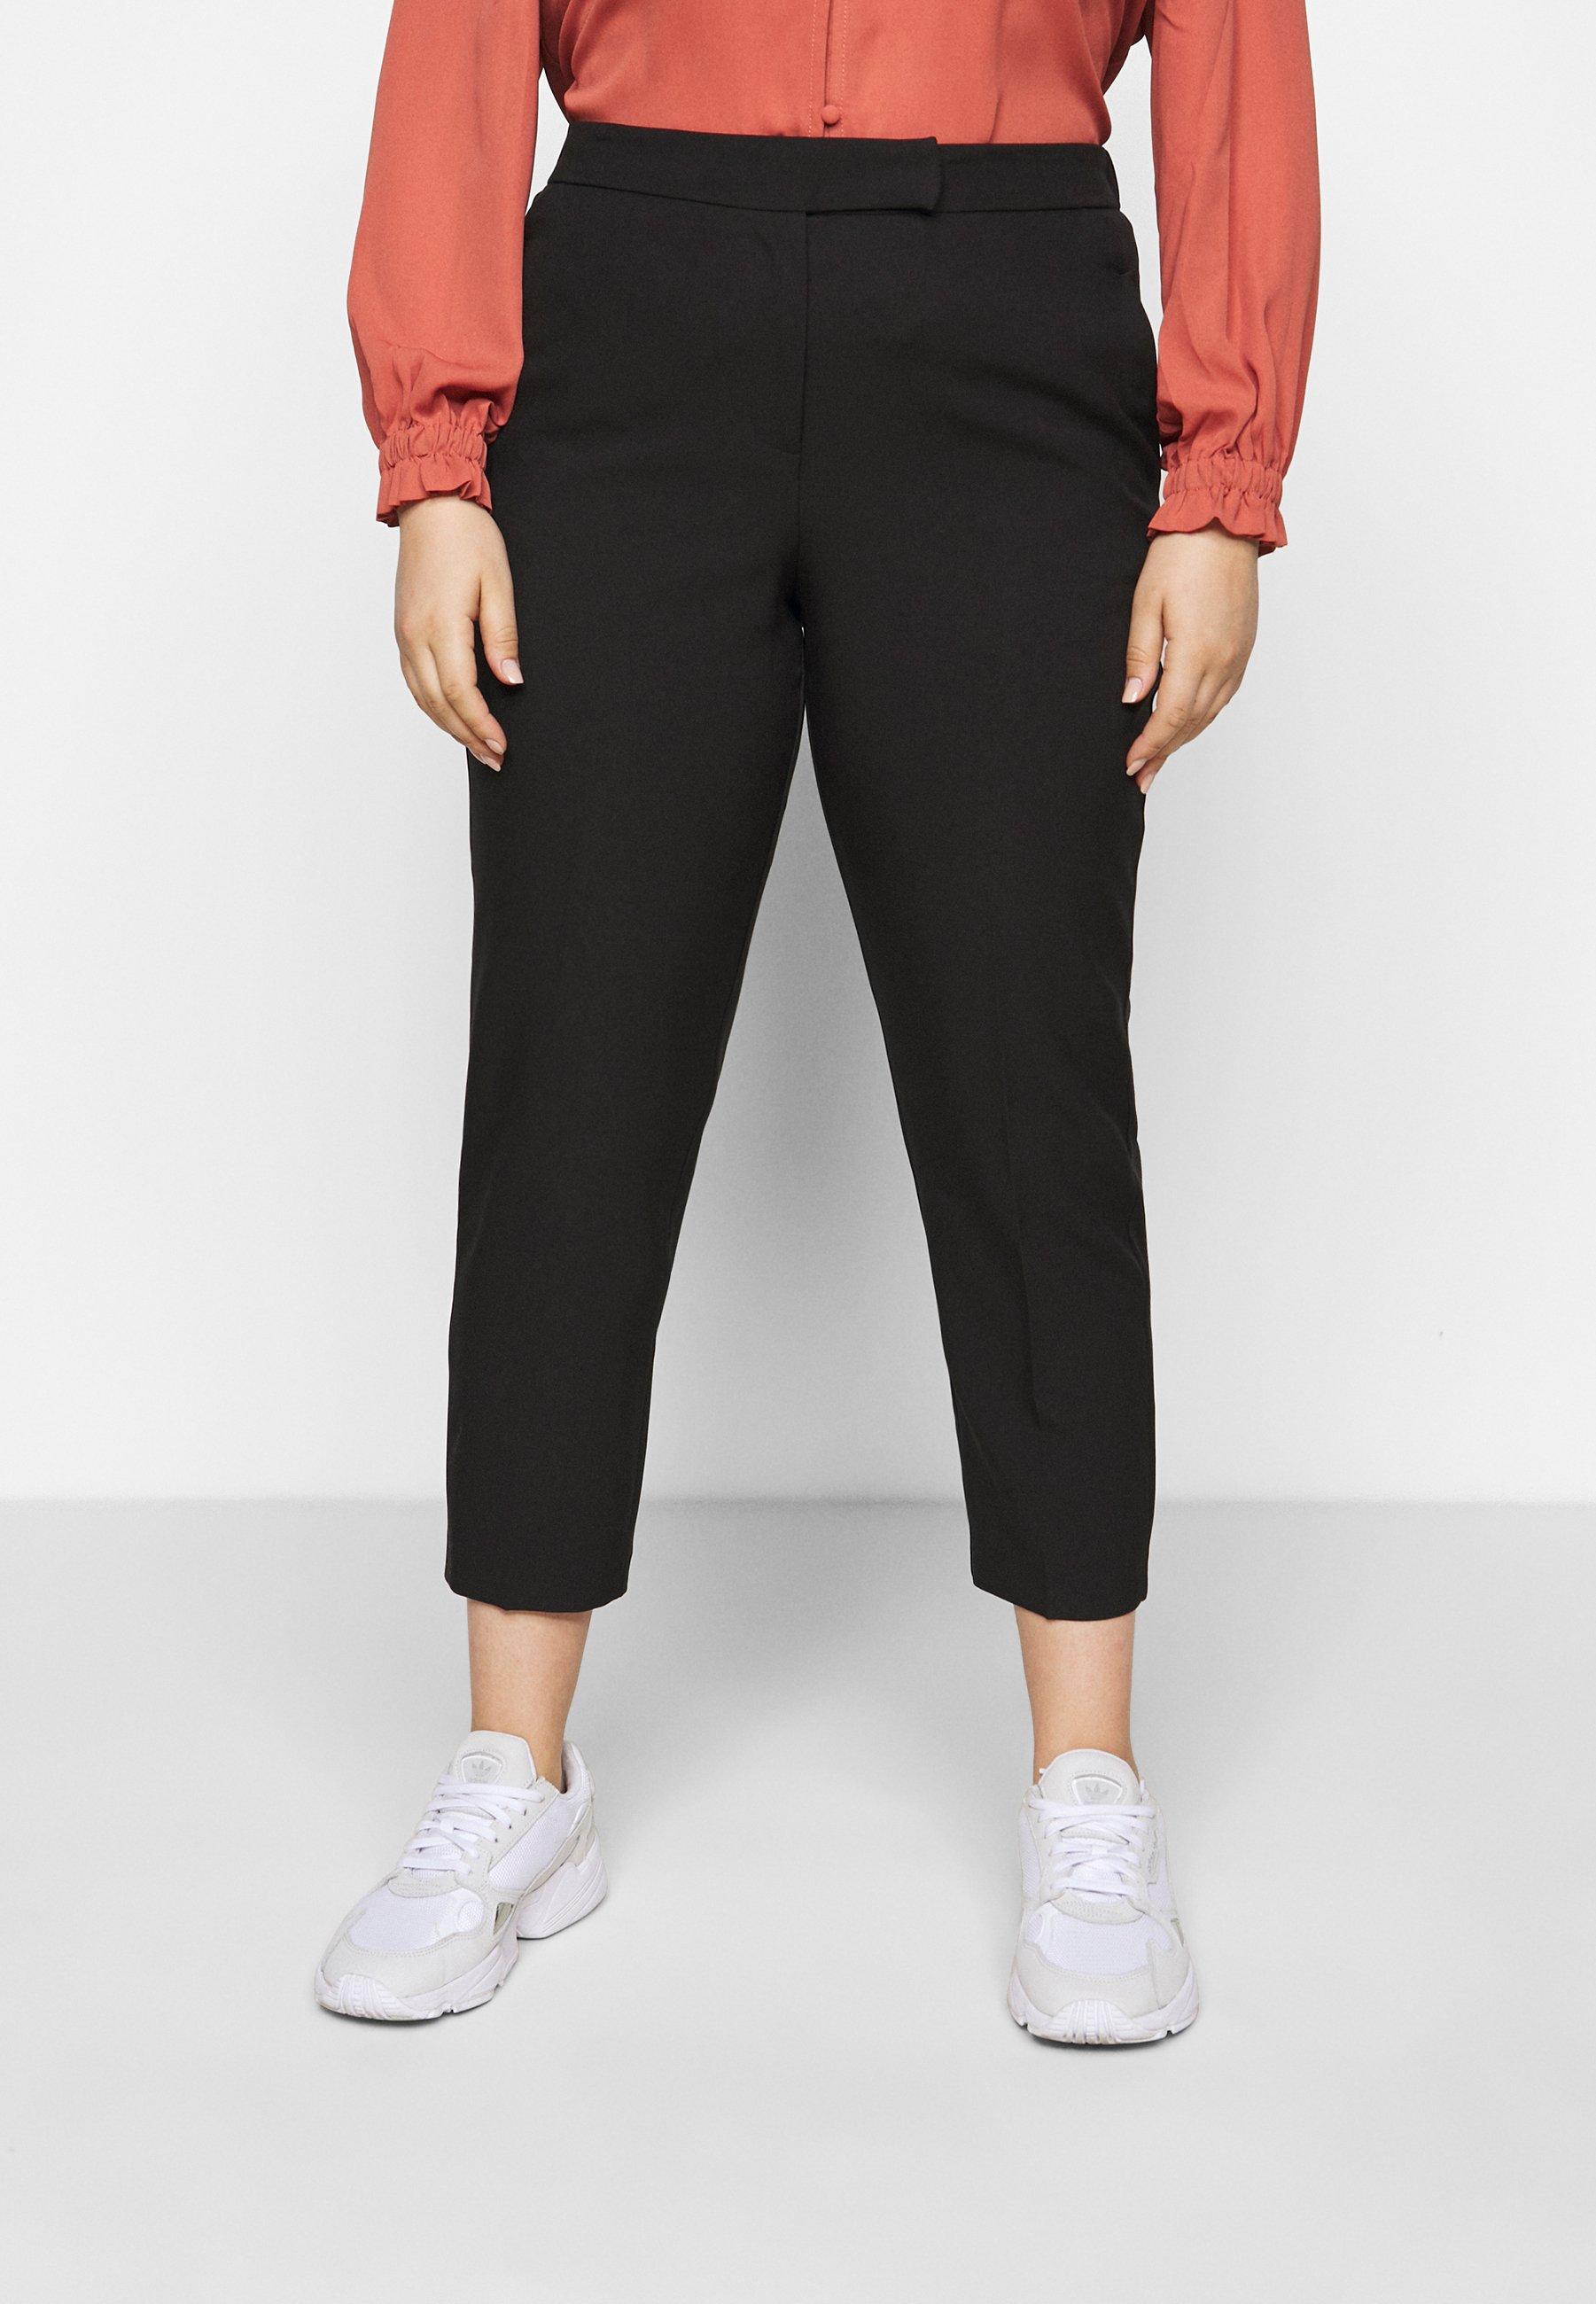 Femme ESSENTIAL TAPERED TROUSER - Pantalon classique